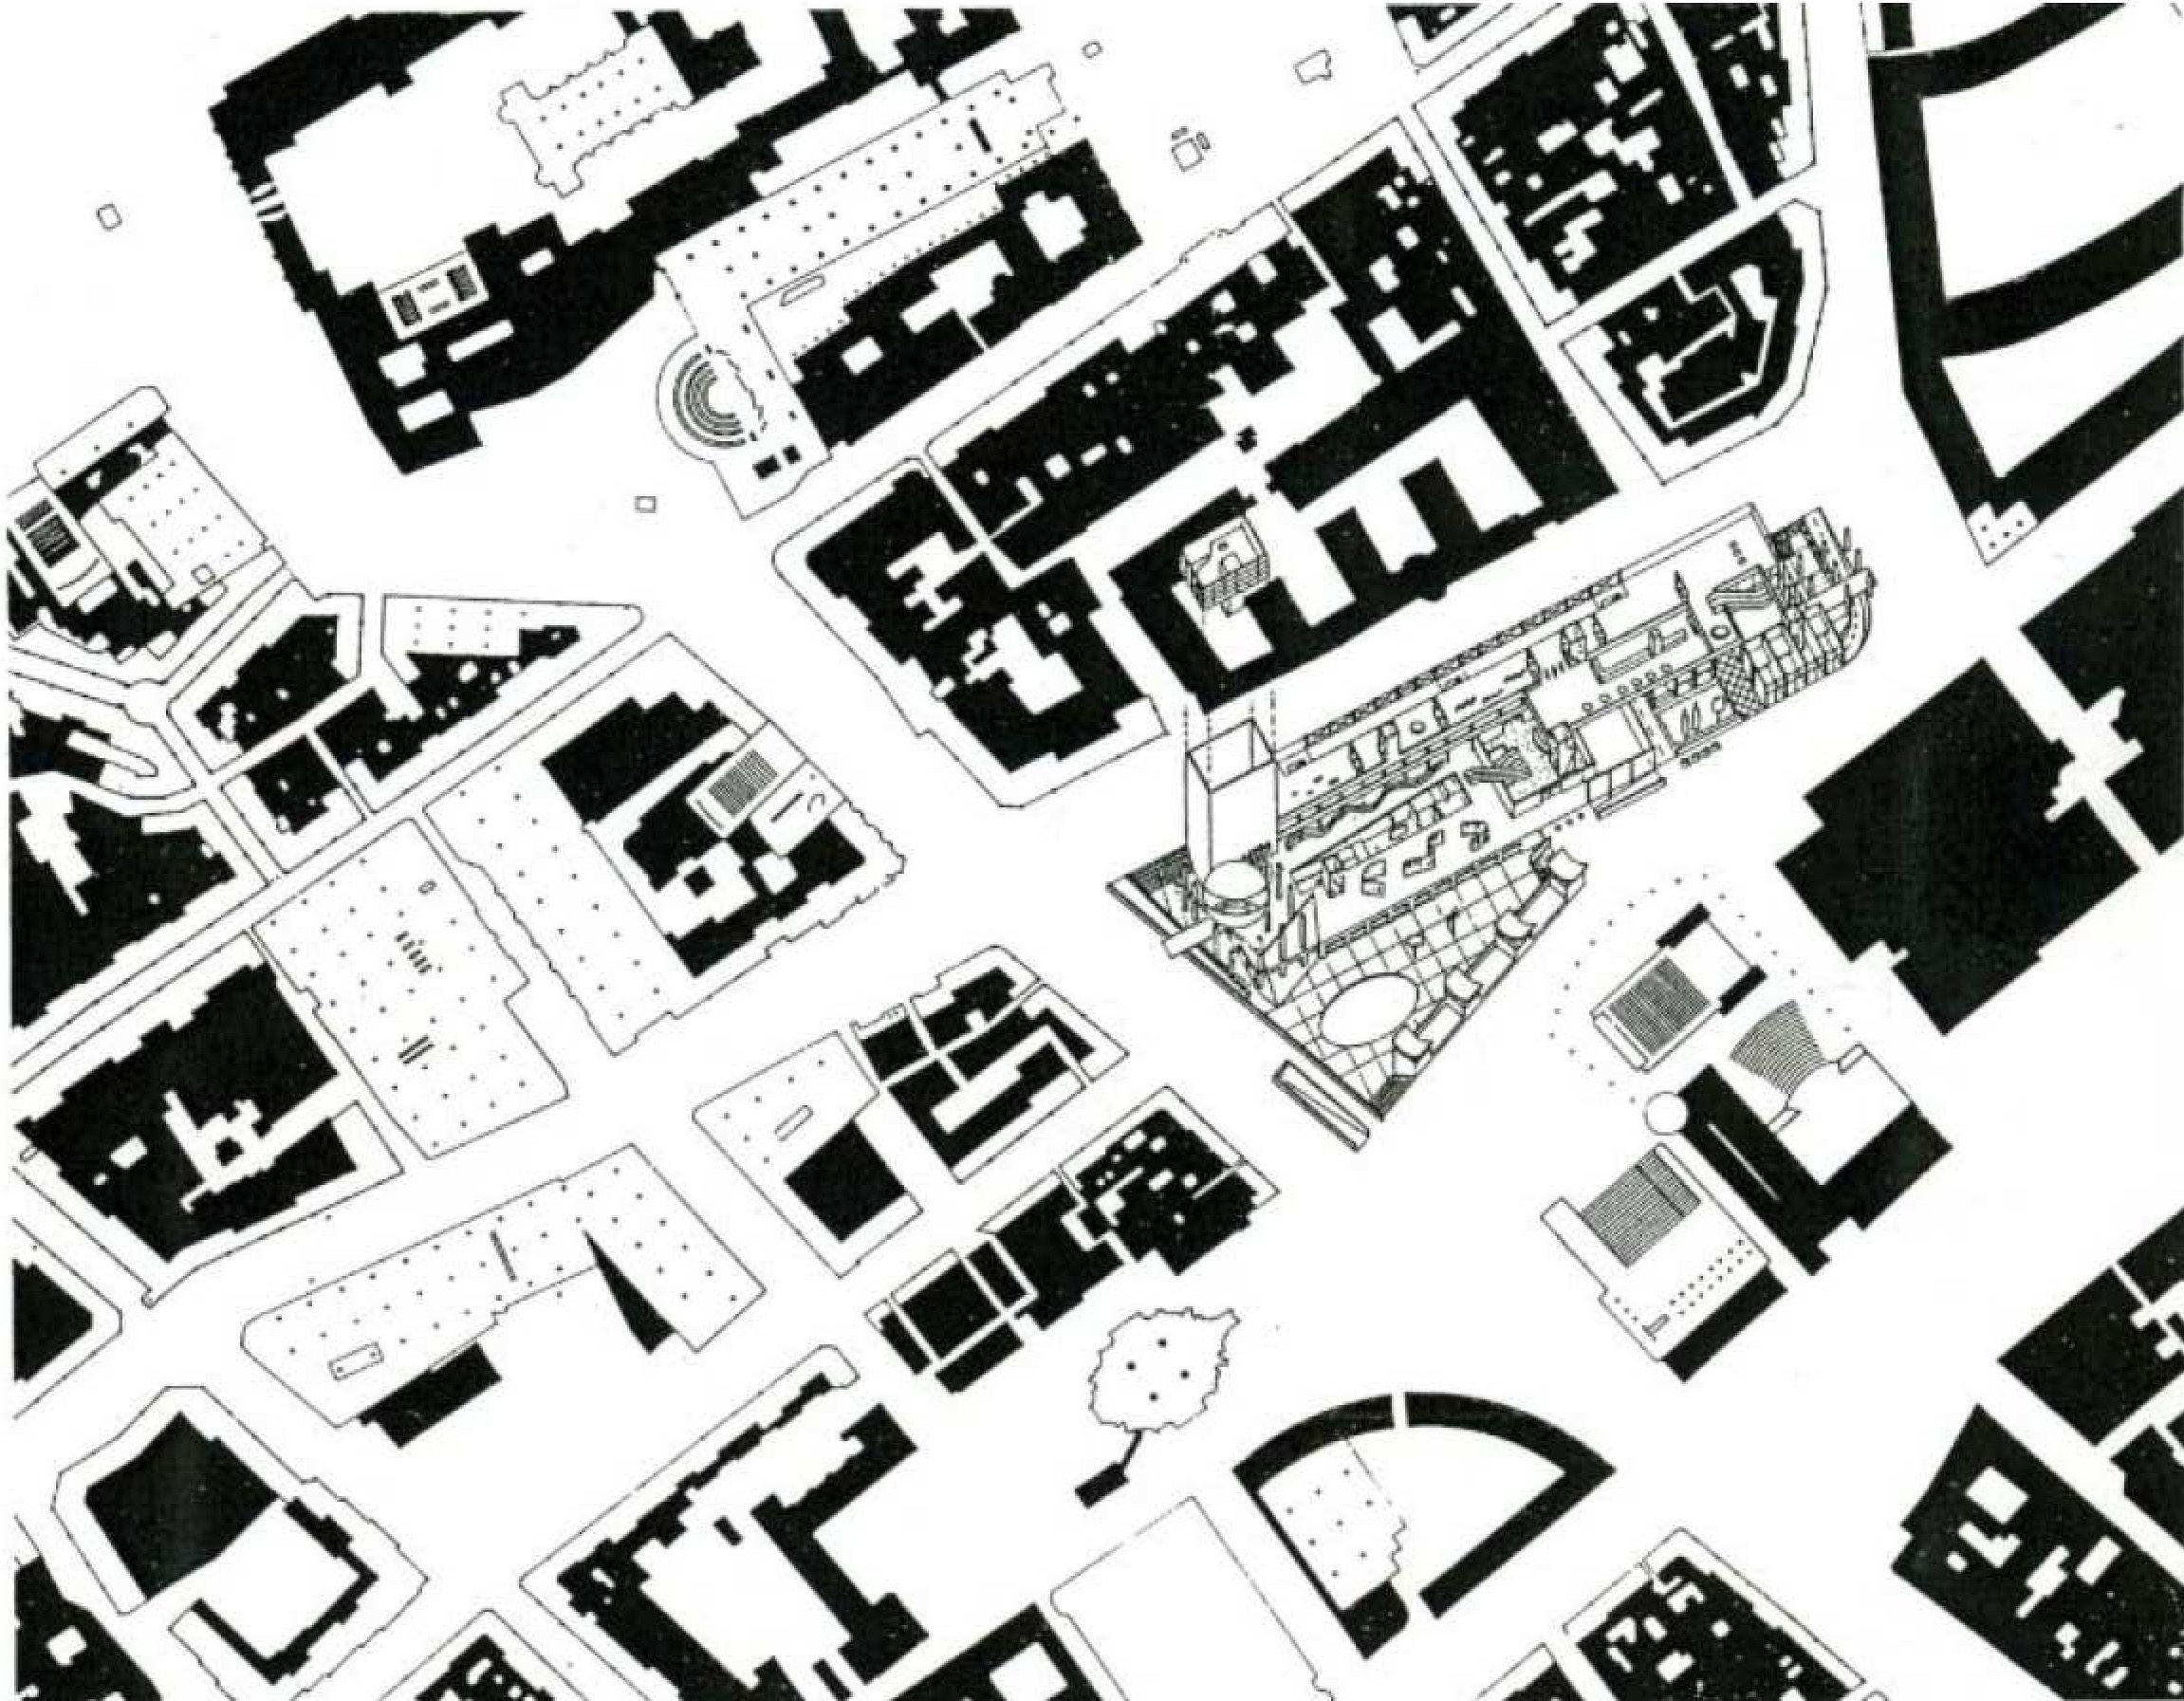 municipiojpg 23021793 Map IllustrationsCrossword municipiojpg 23021793